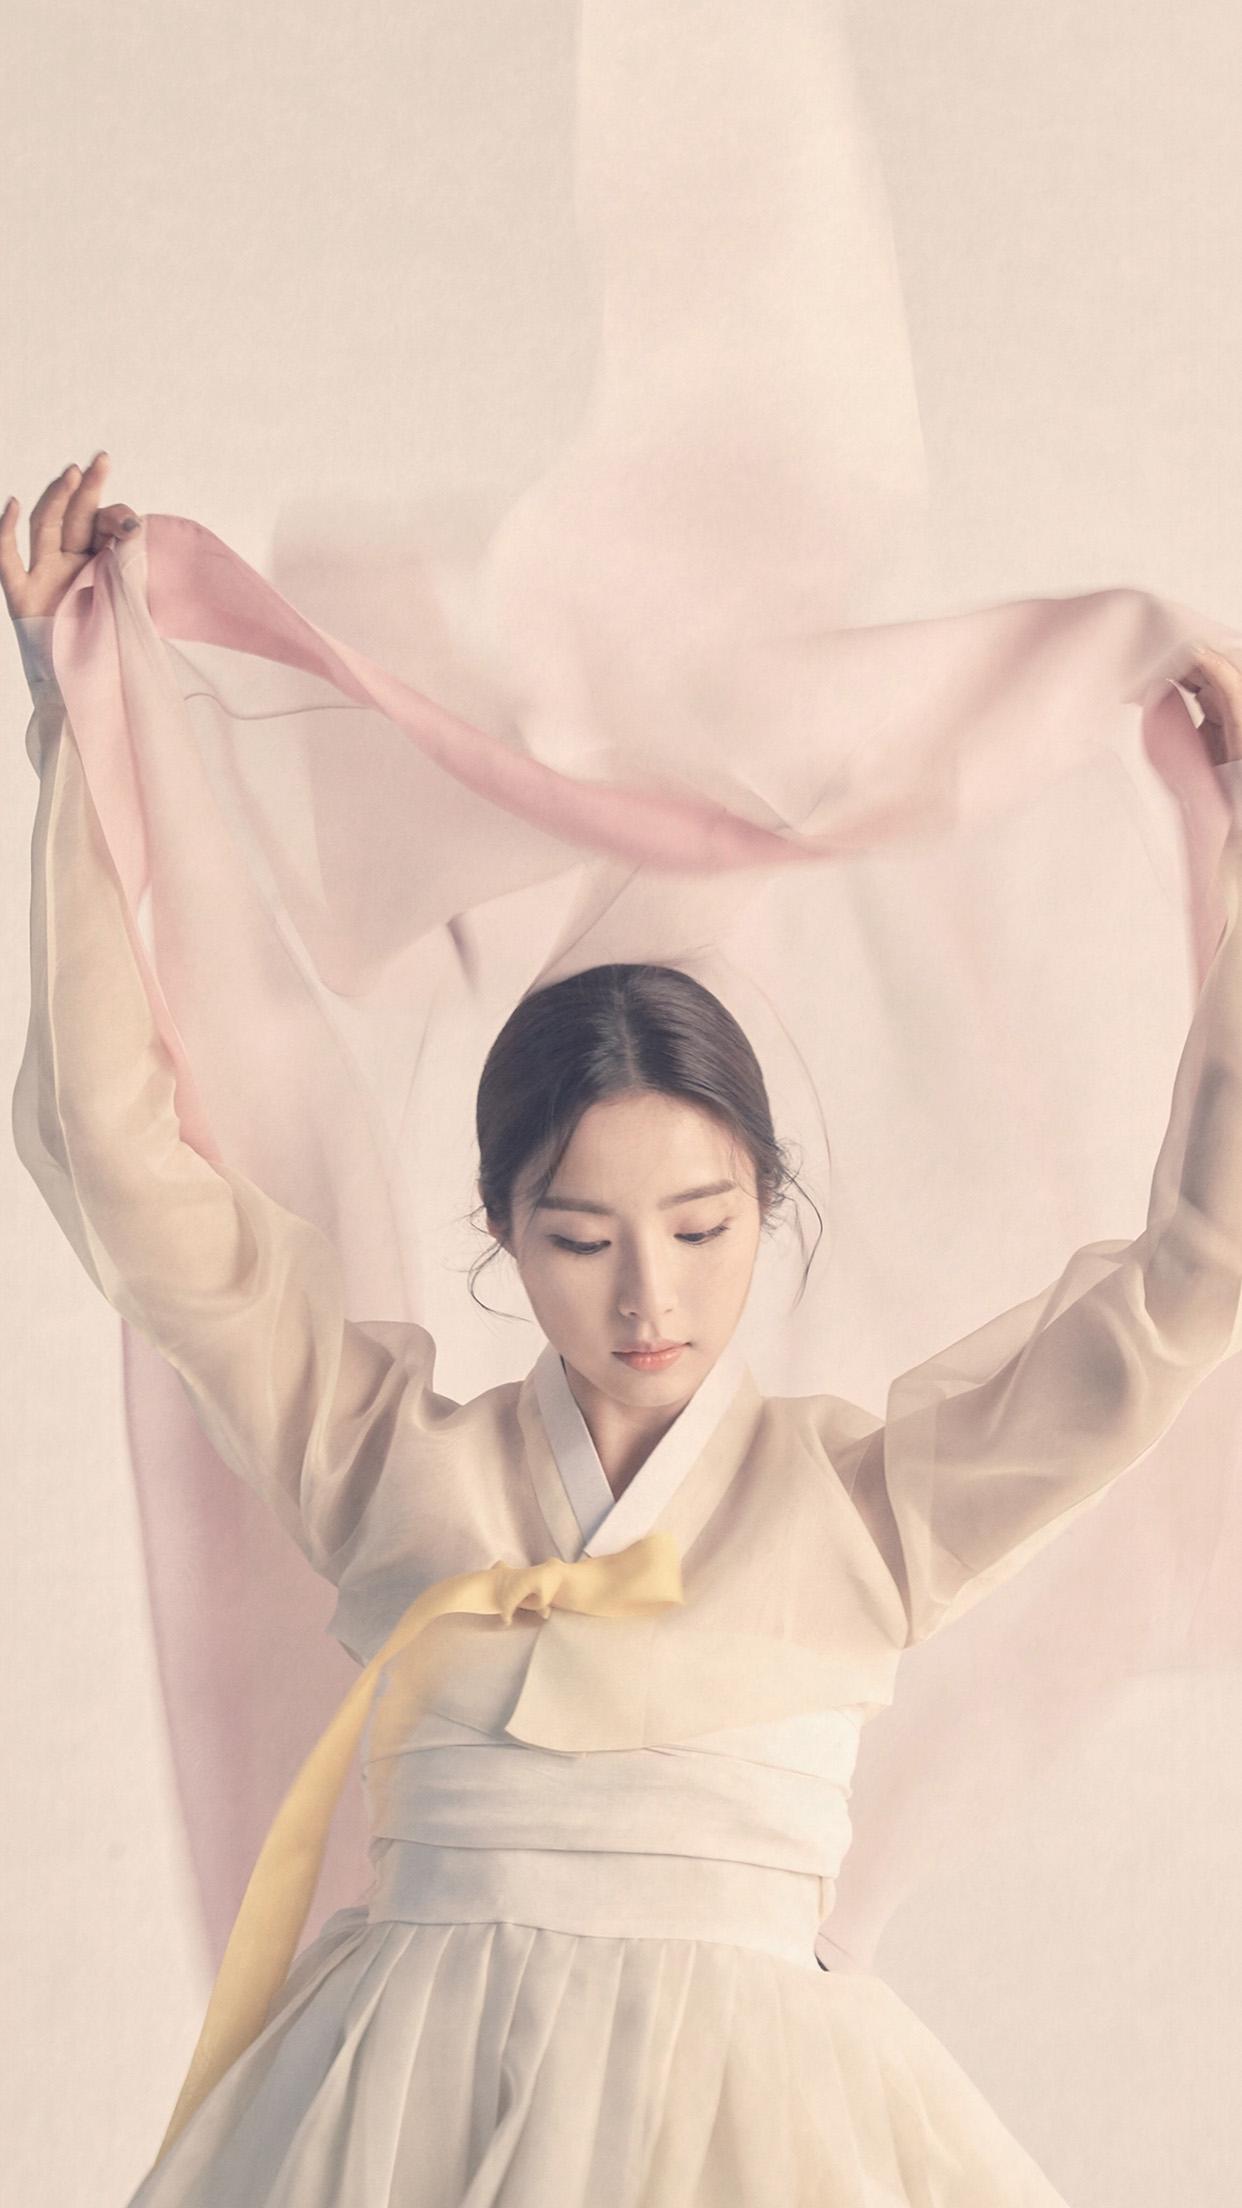 Hp65 Korean Asian Kpop Girl Dress Pink Wallpaper